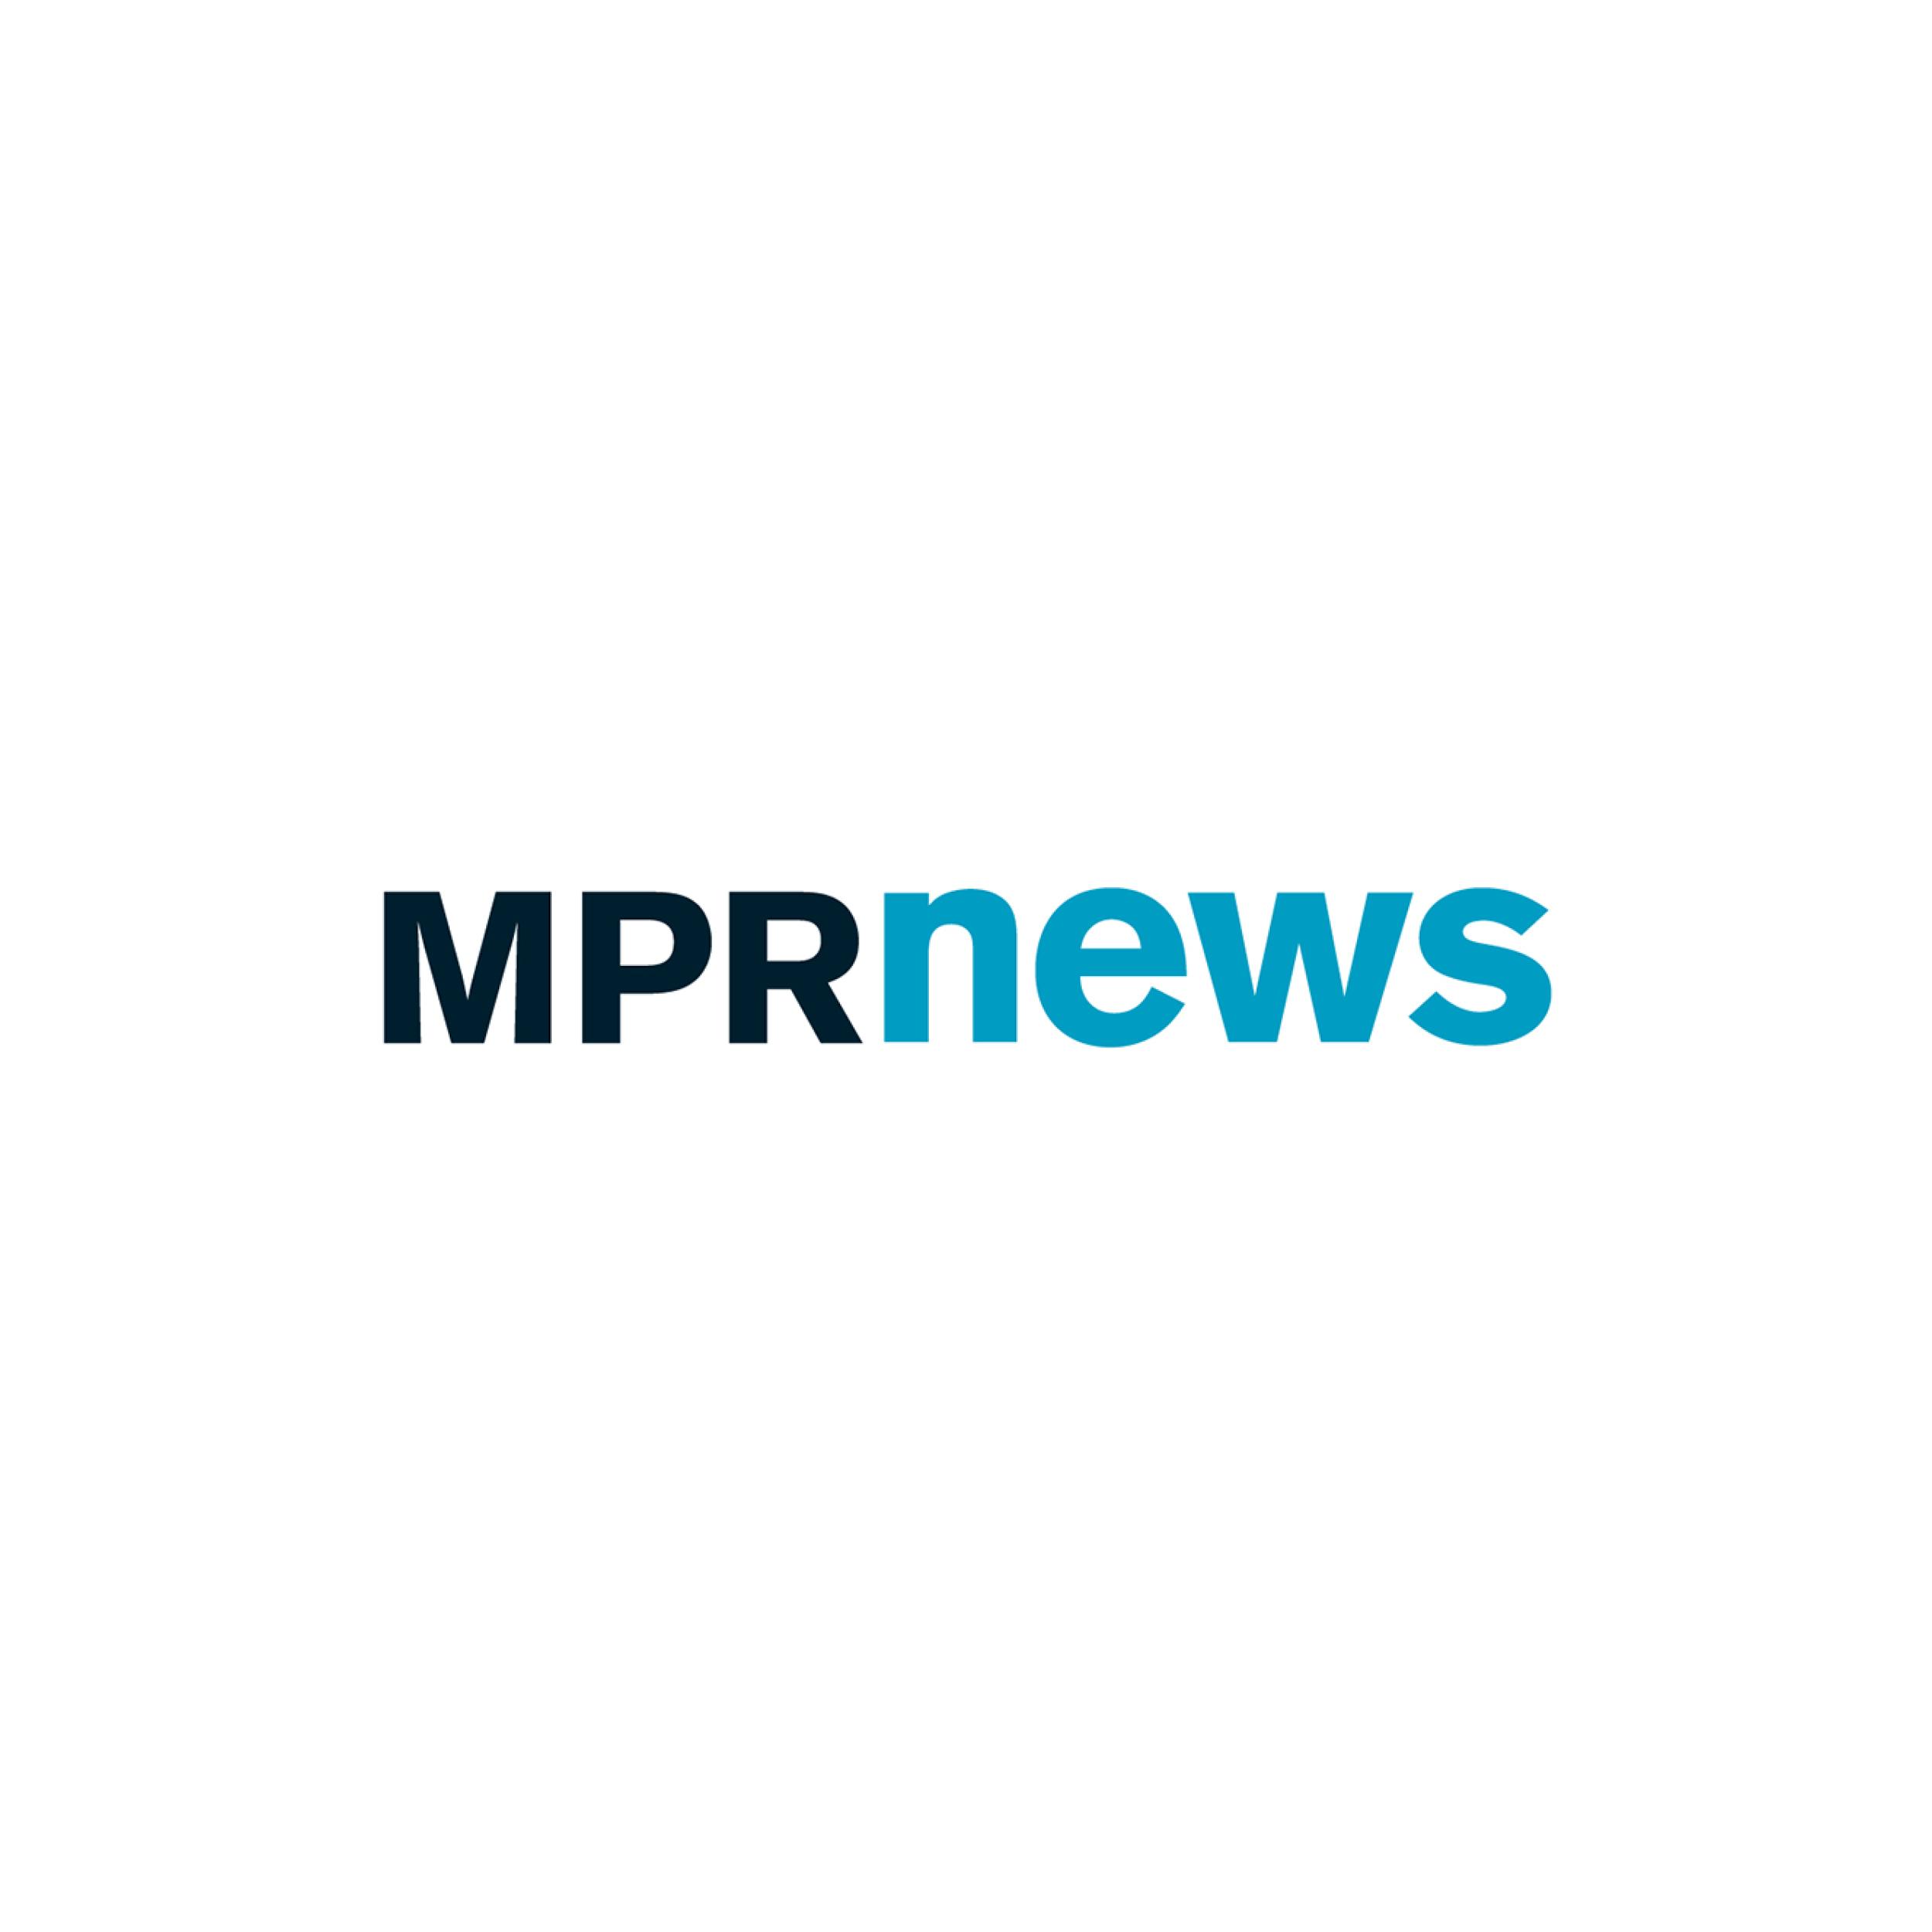 mprnews-covensite.png